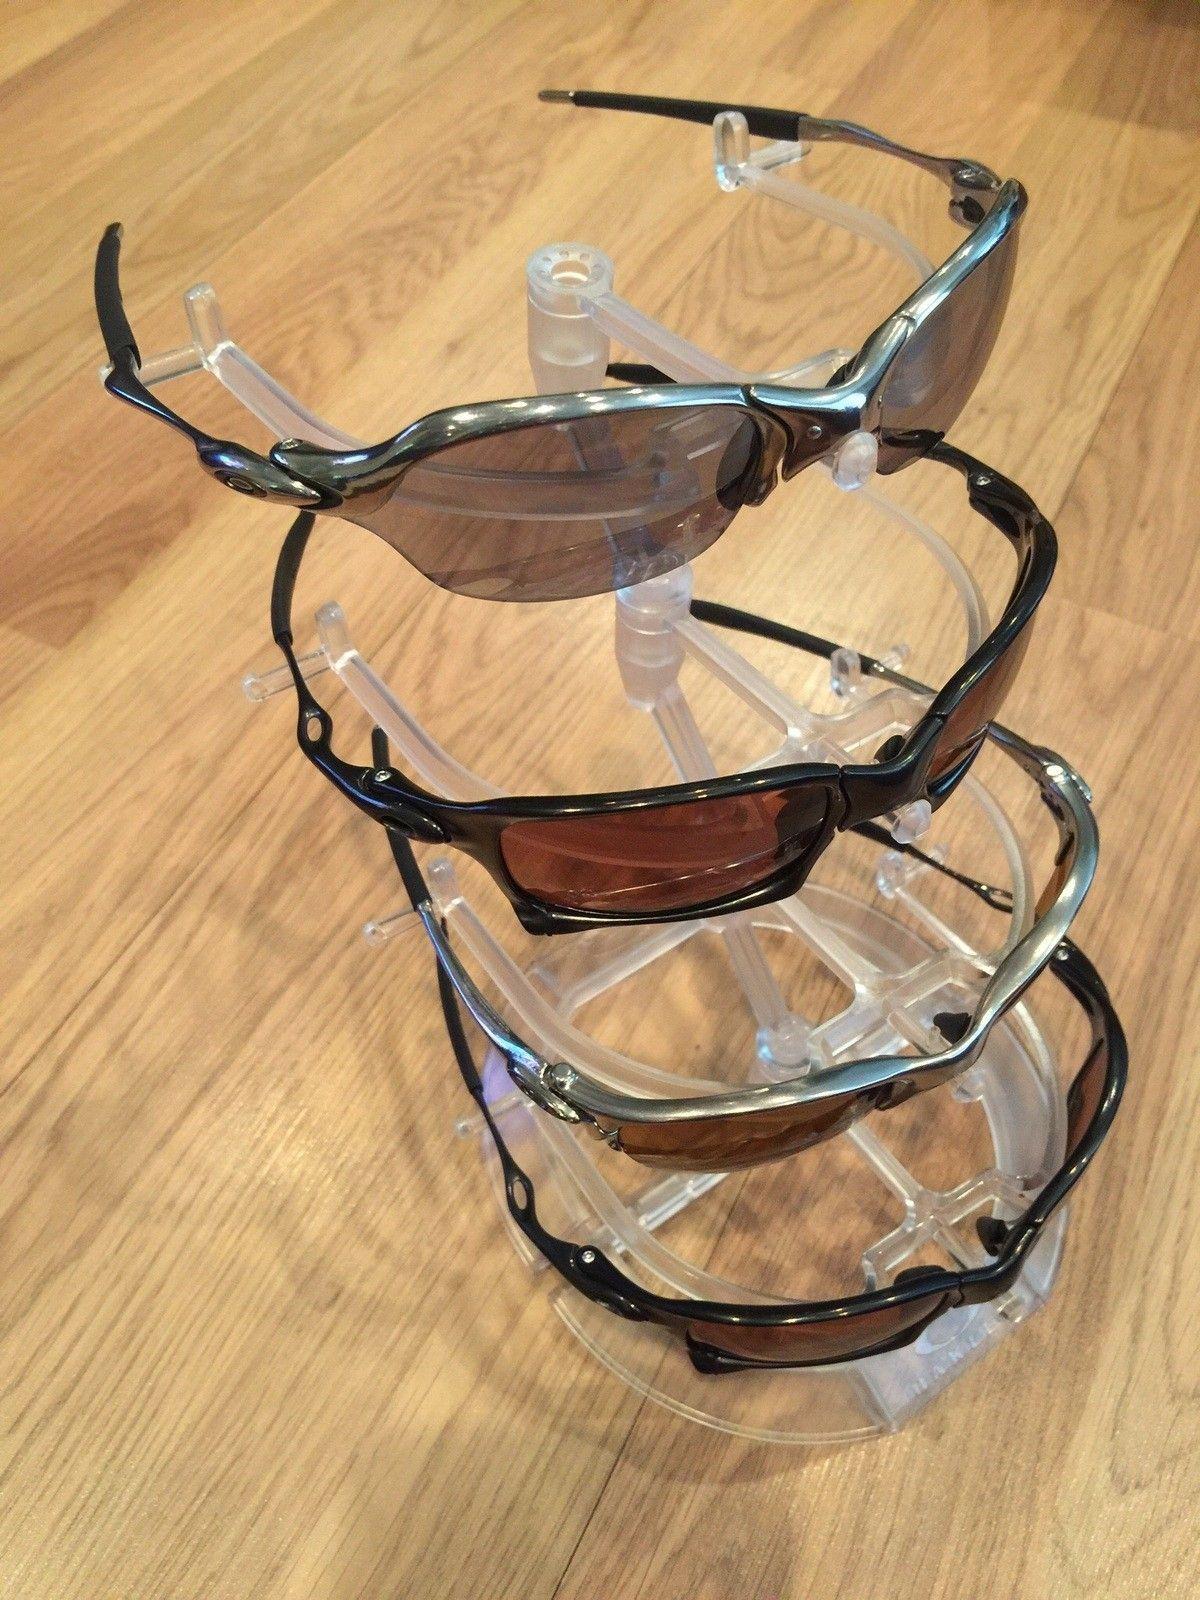 New Sunglasses Stand 4.0 - image.jpg